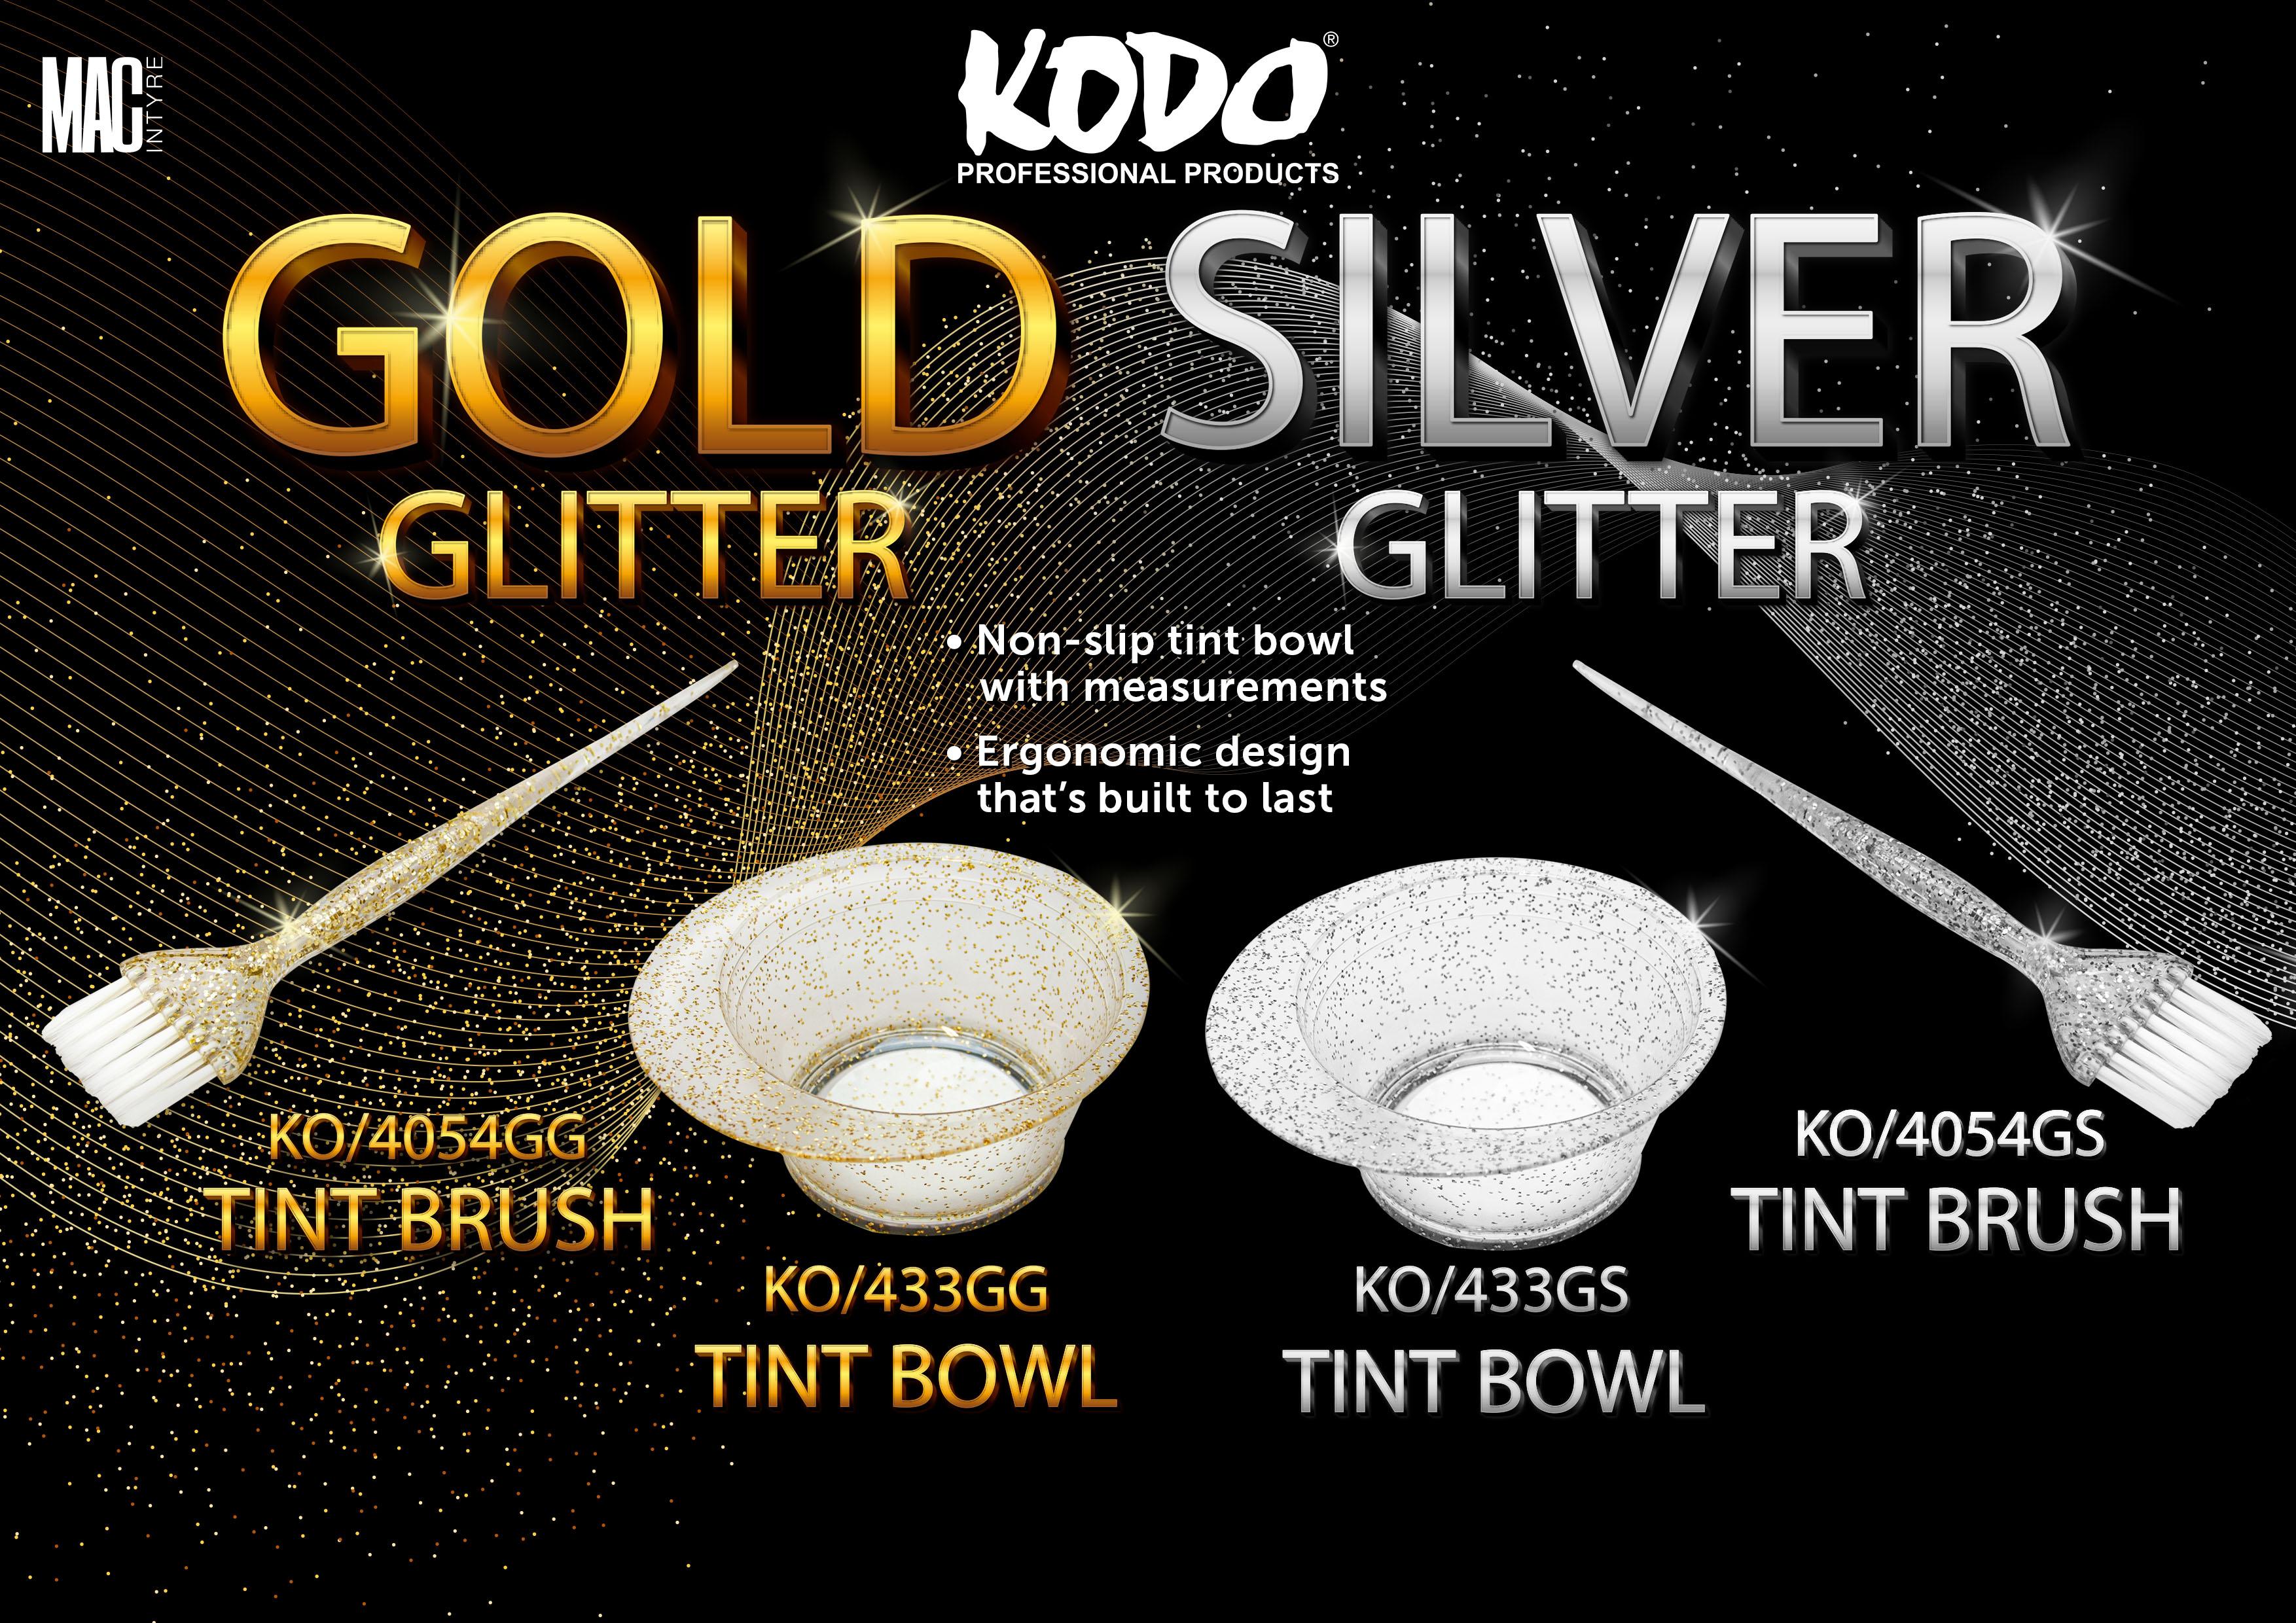 Kodo Glitter Tint Brushes & Bowls